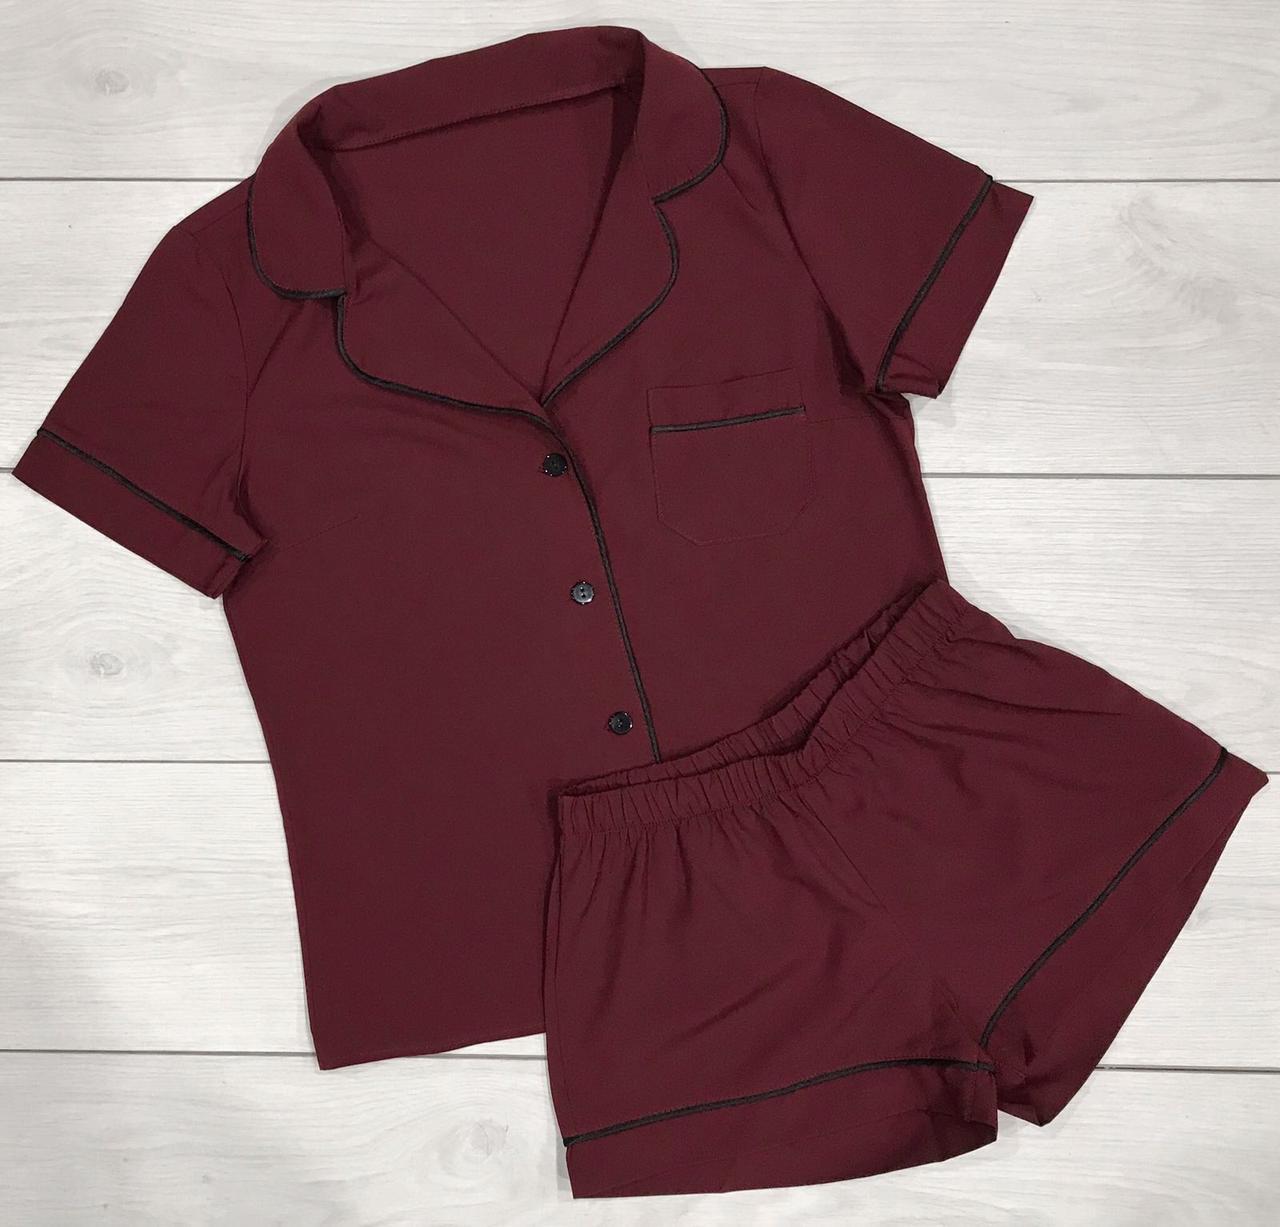 Пижама рубашка и шорты женские.